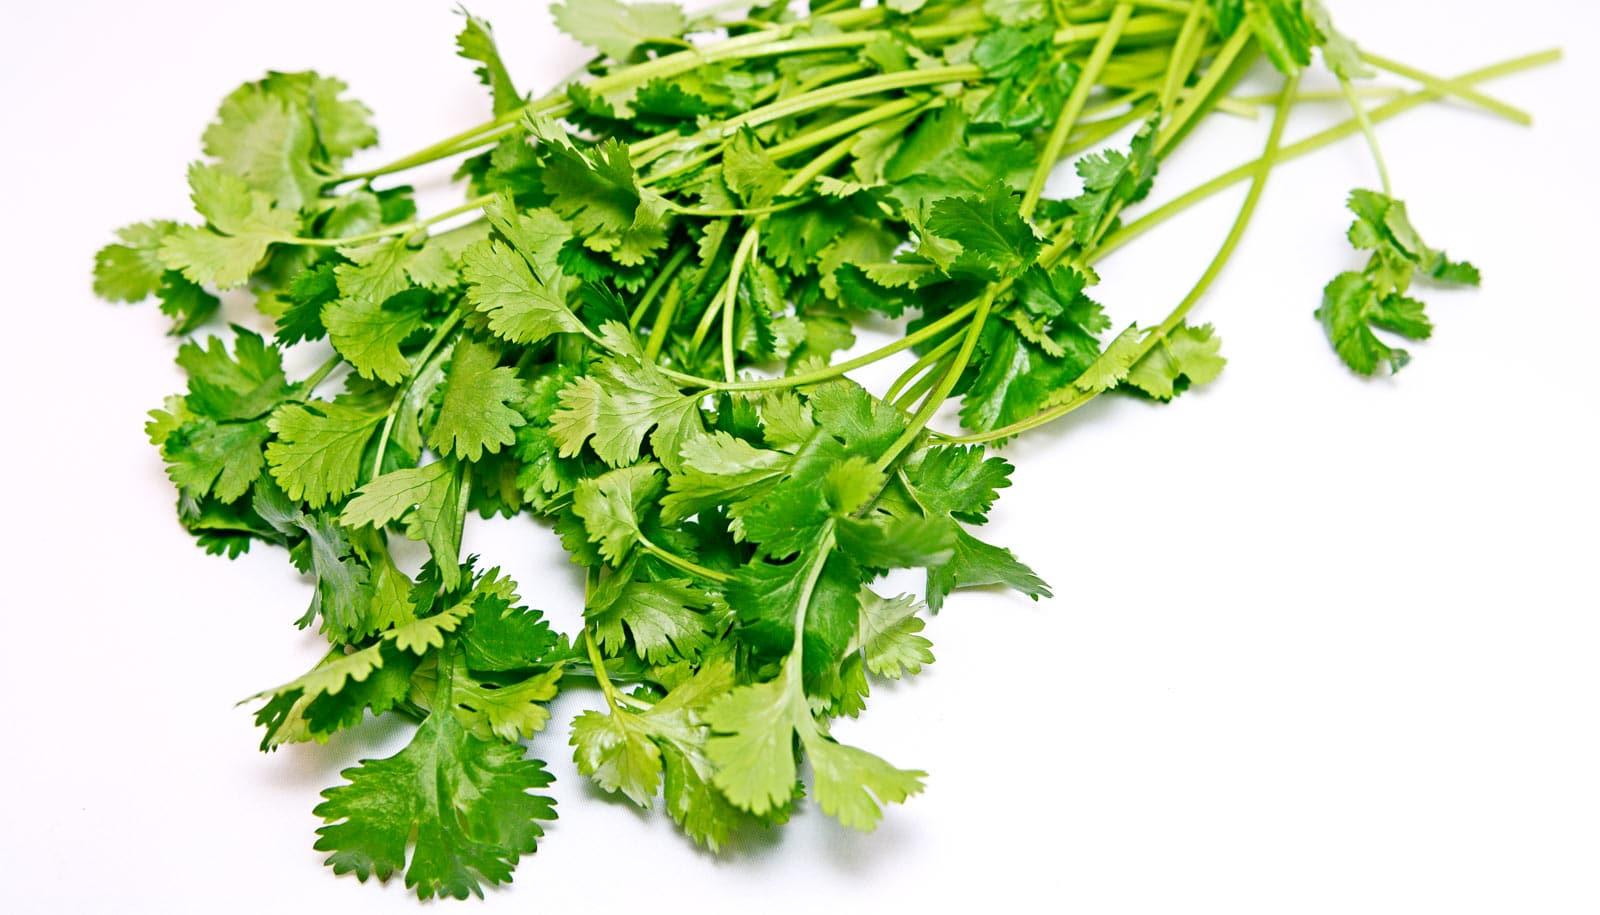 Scientists now know how cilantro works against seizures